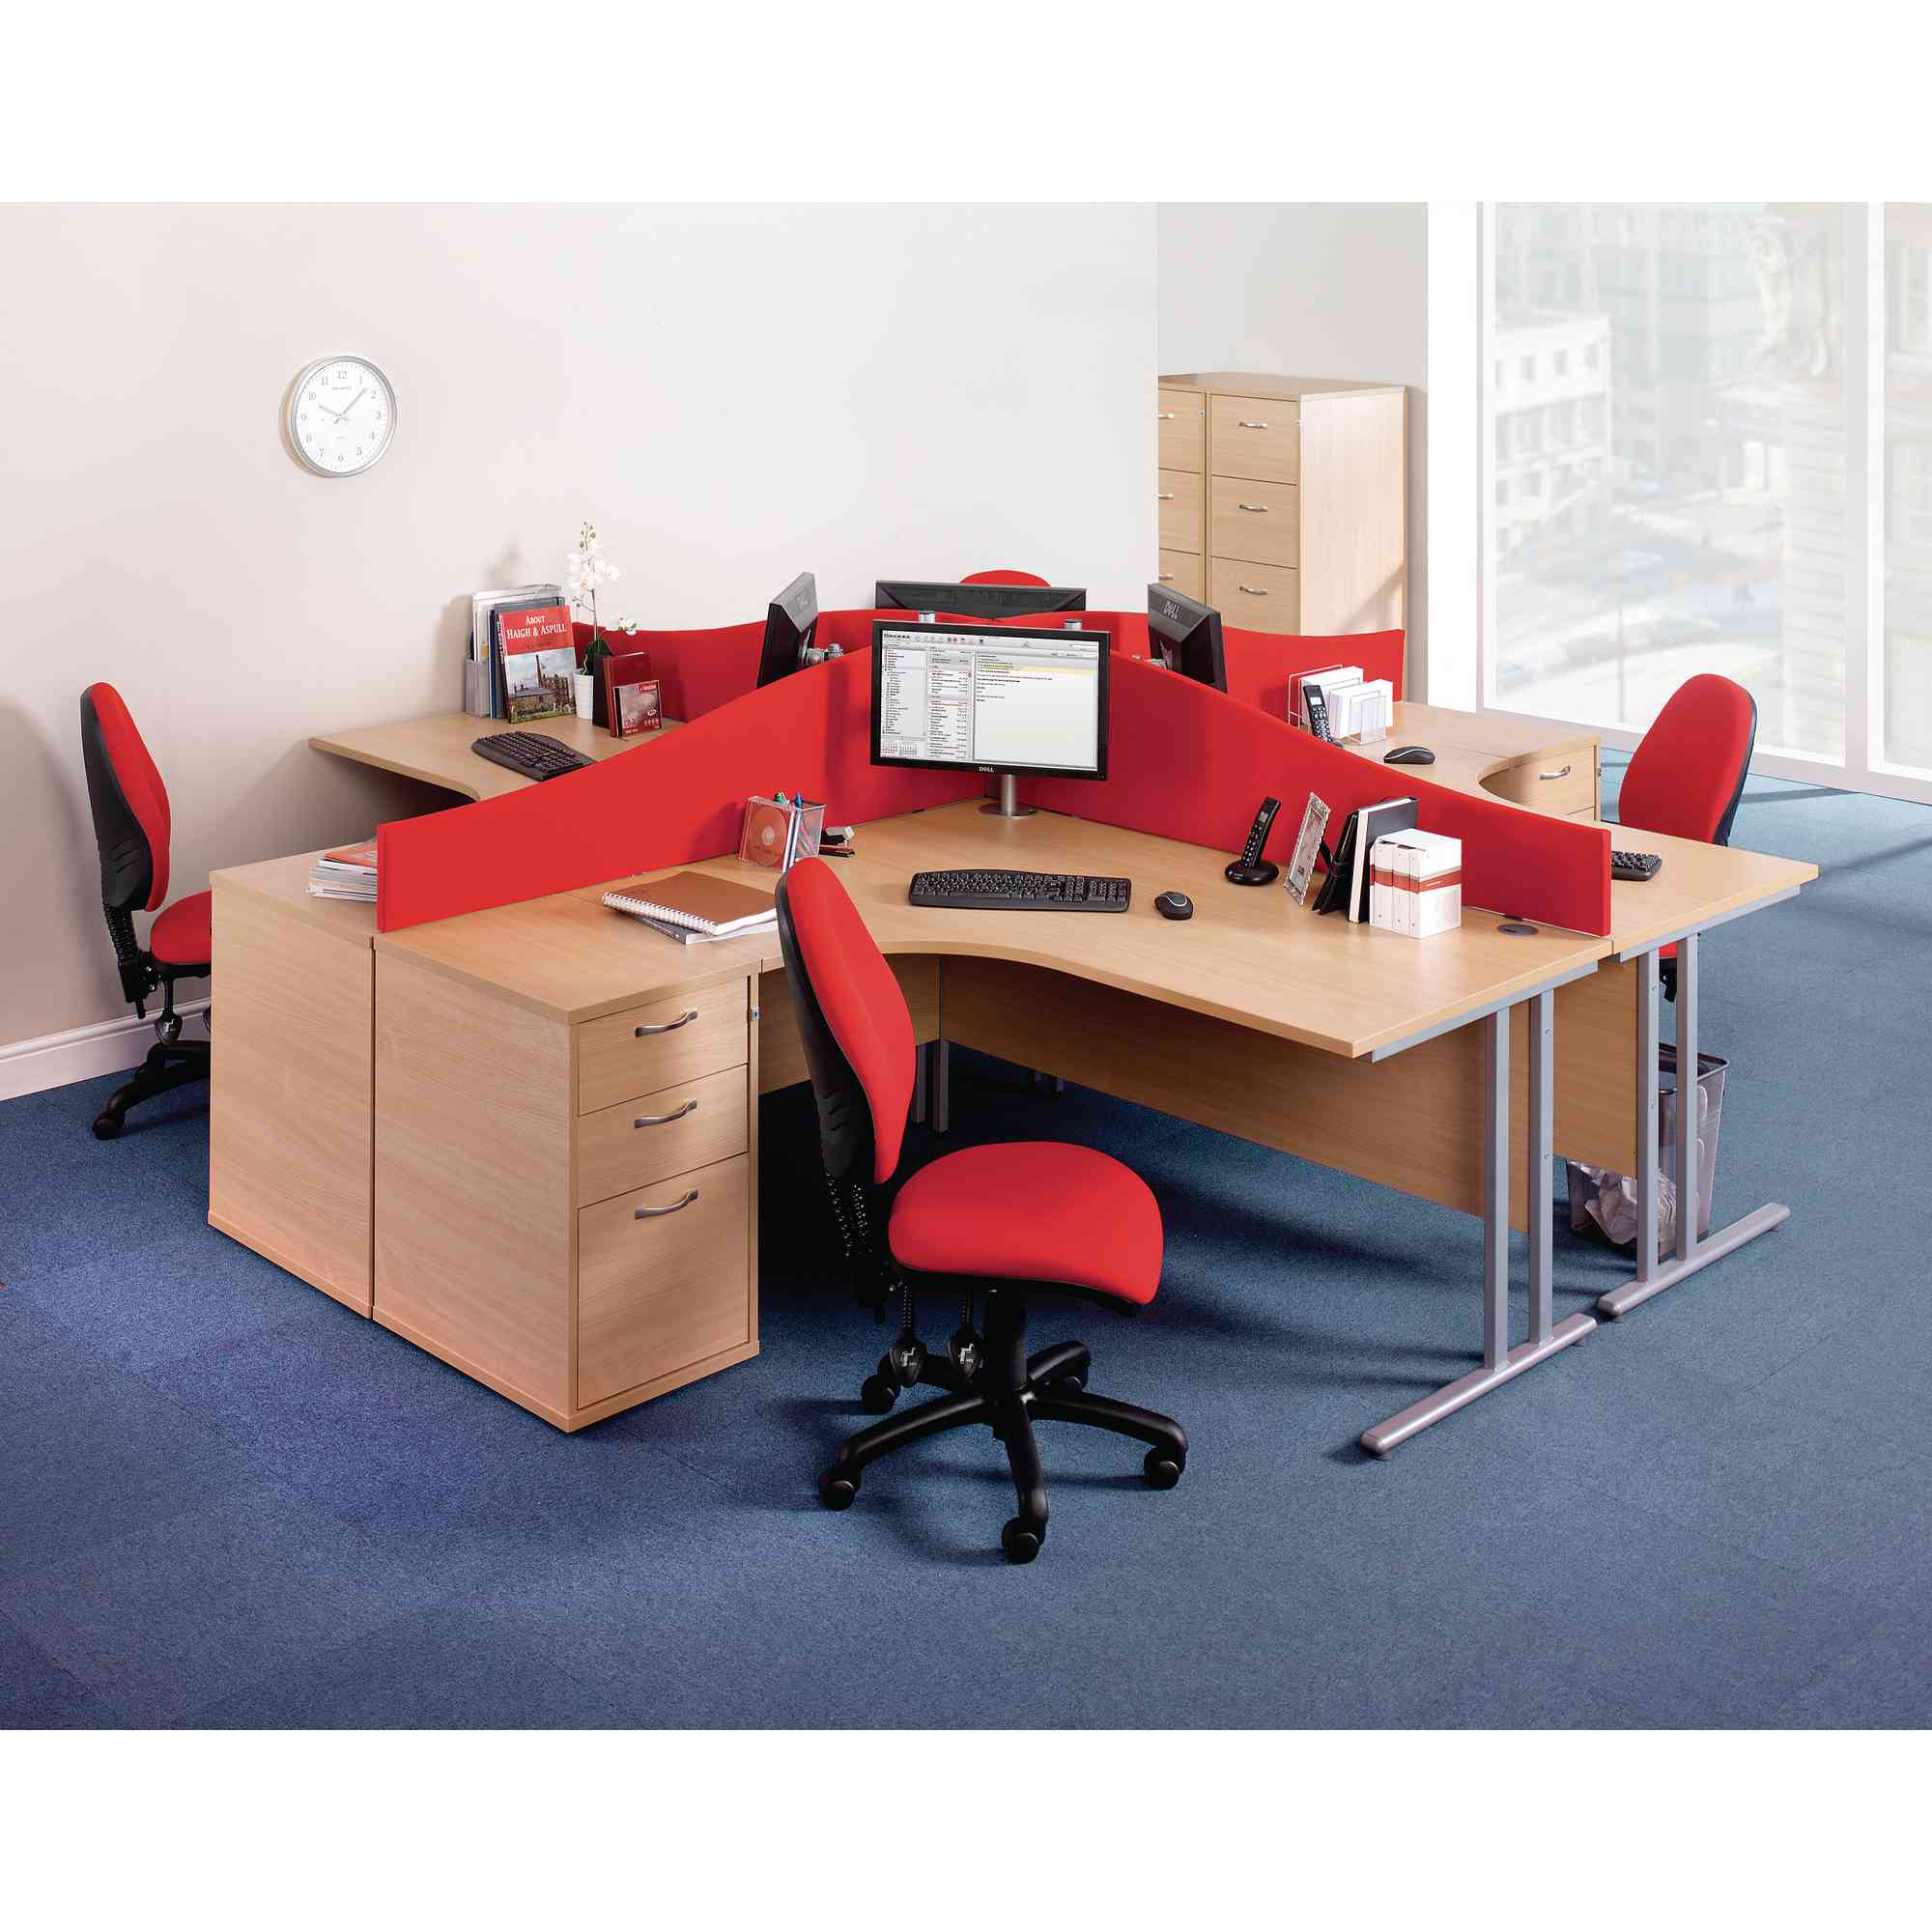 Desk Mounted Screens W1400mm Blue Gls Educational